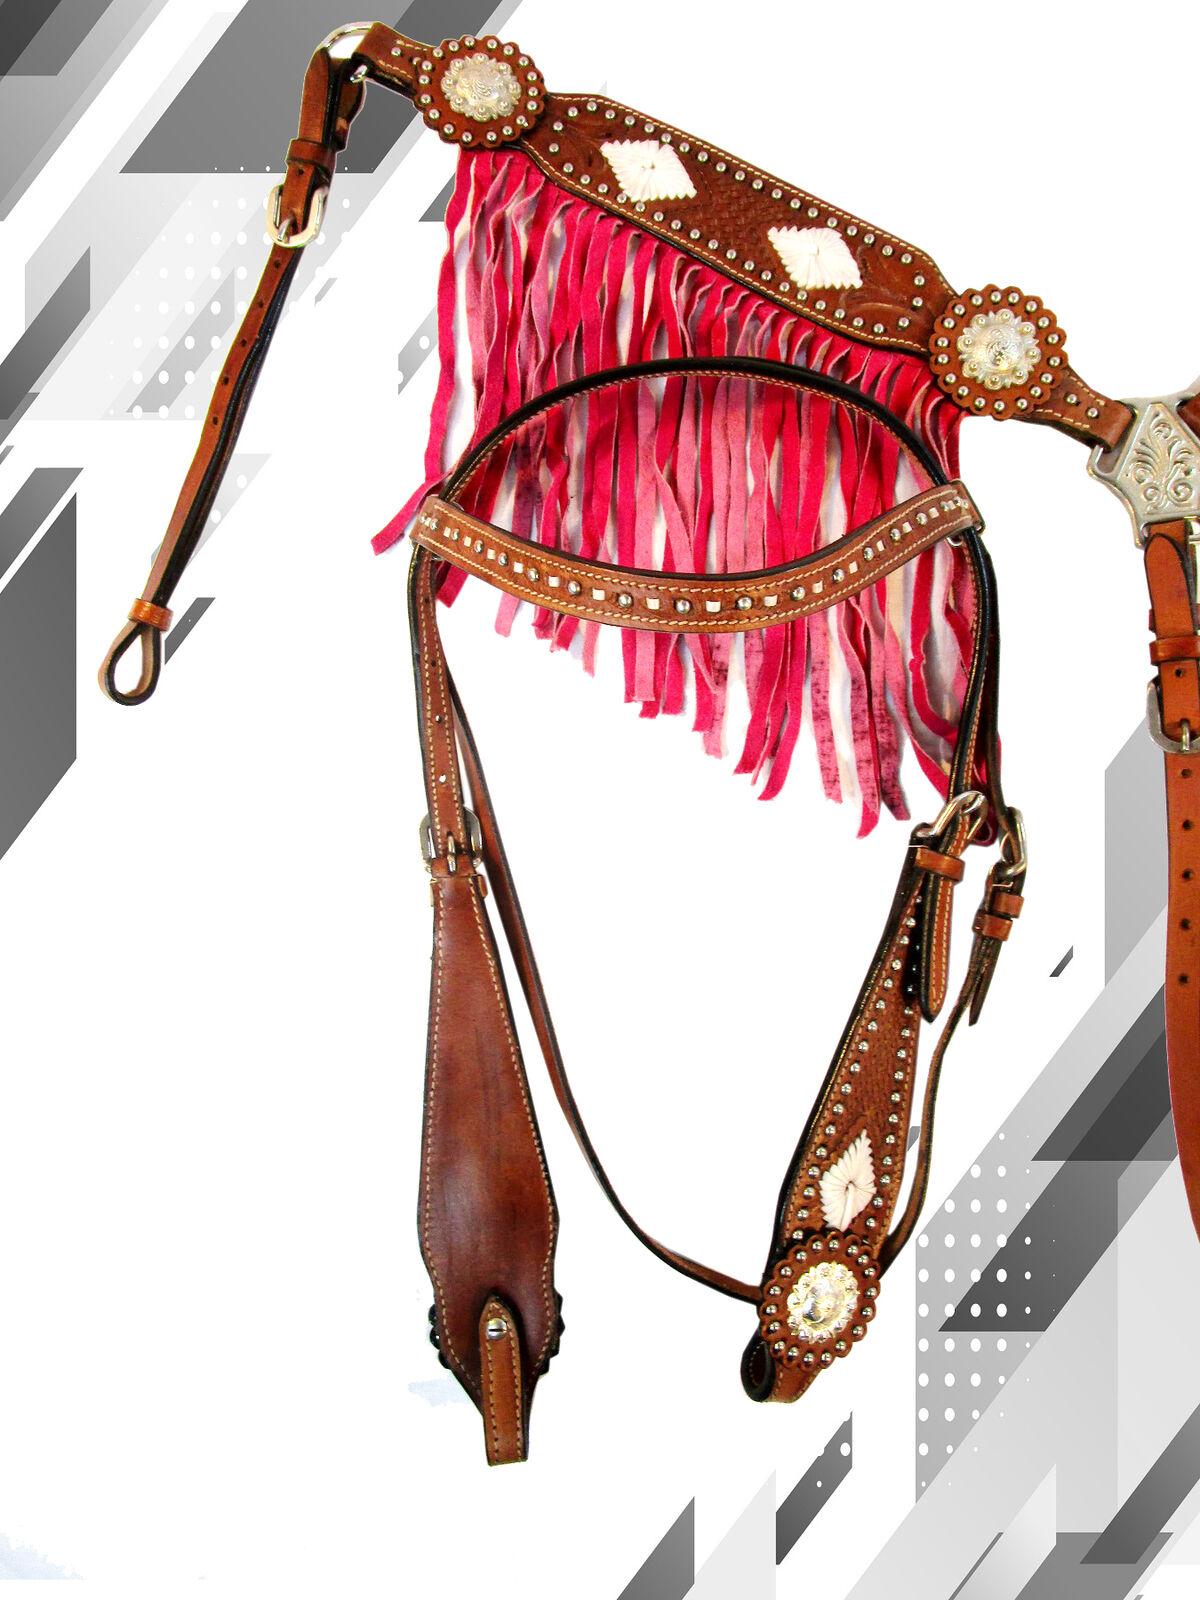 PINK FRINGE STONE HORSE CABEZADA HORSE HEADSTALL TRAIL PLEASURE  BRAESTCOLLAR  official authorization